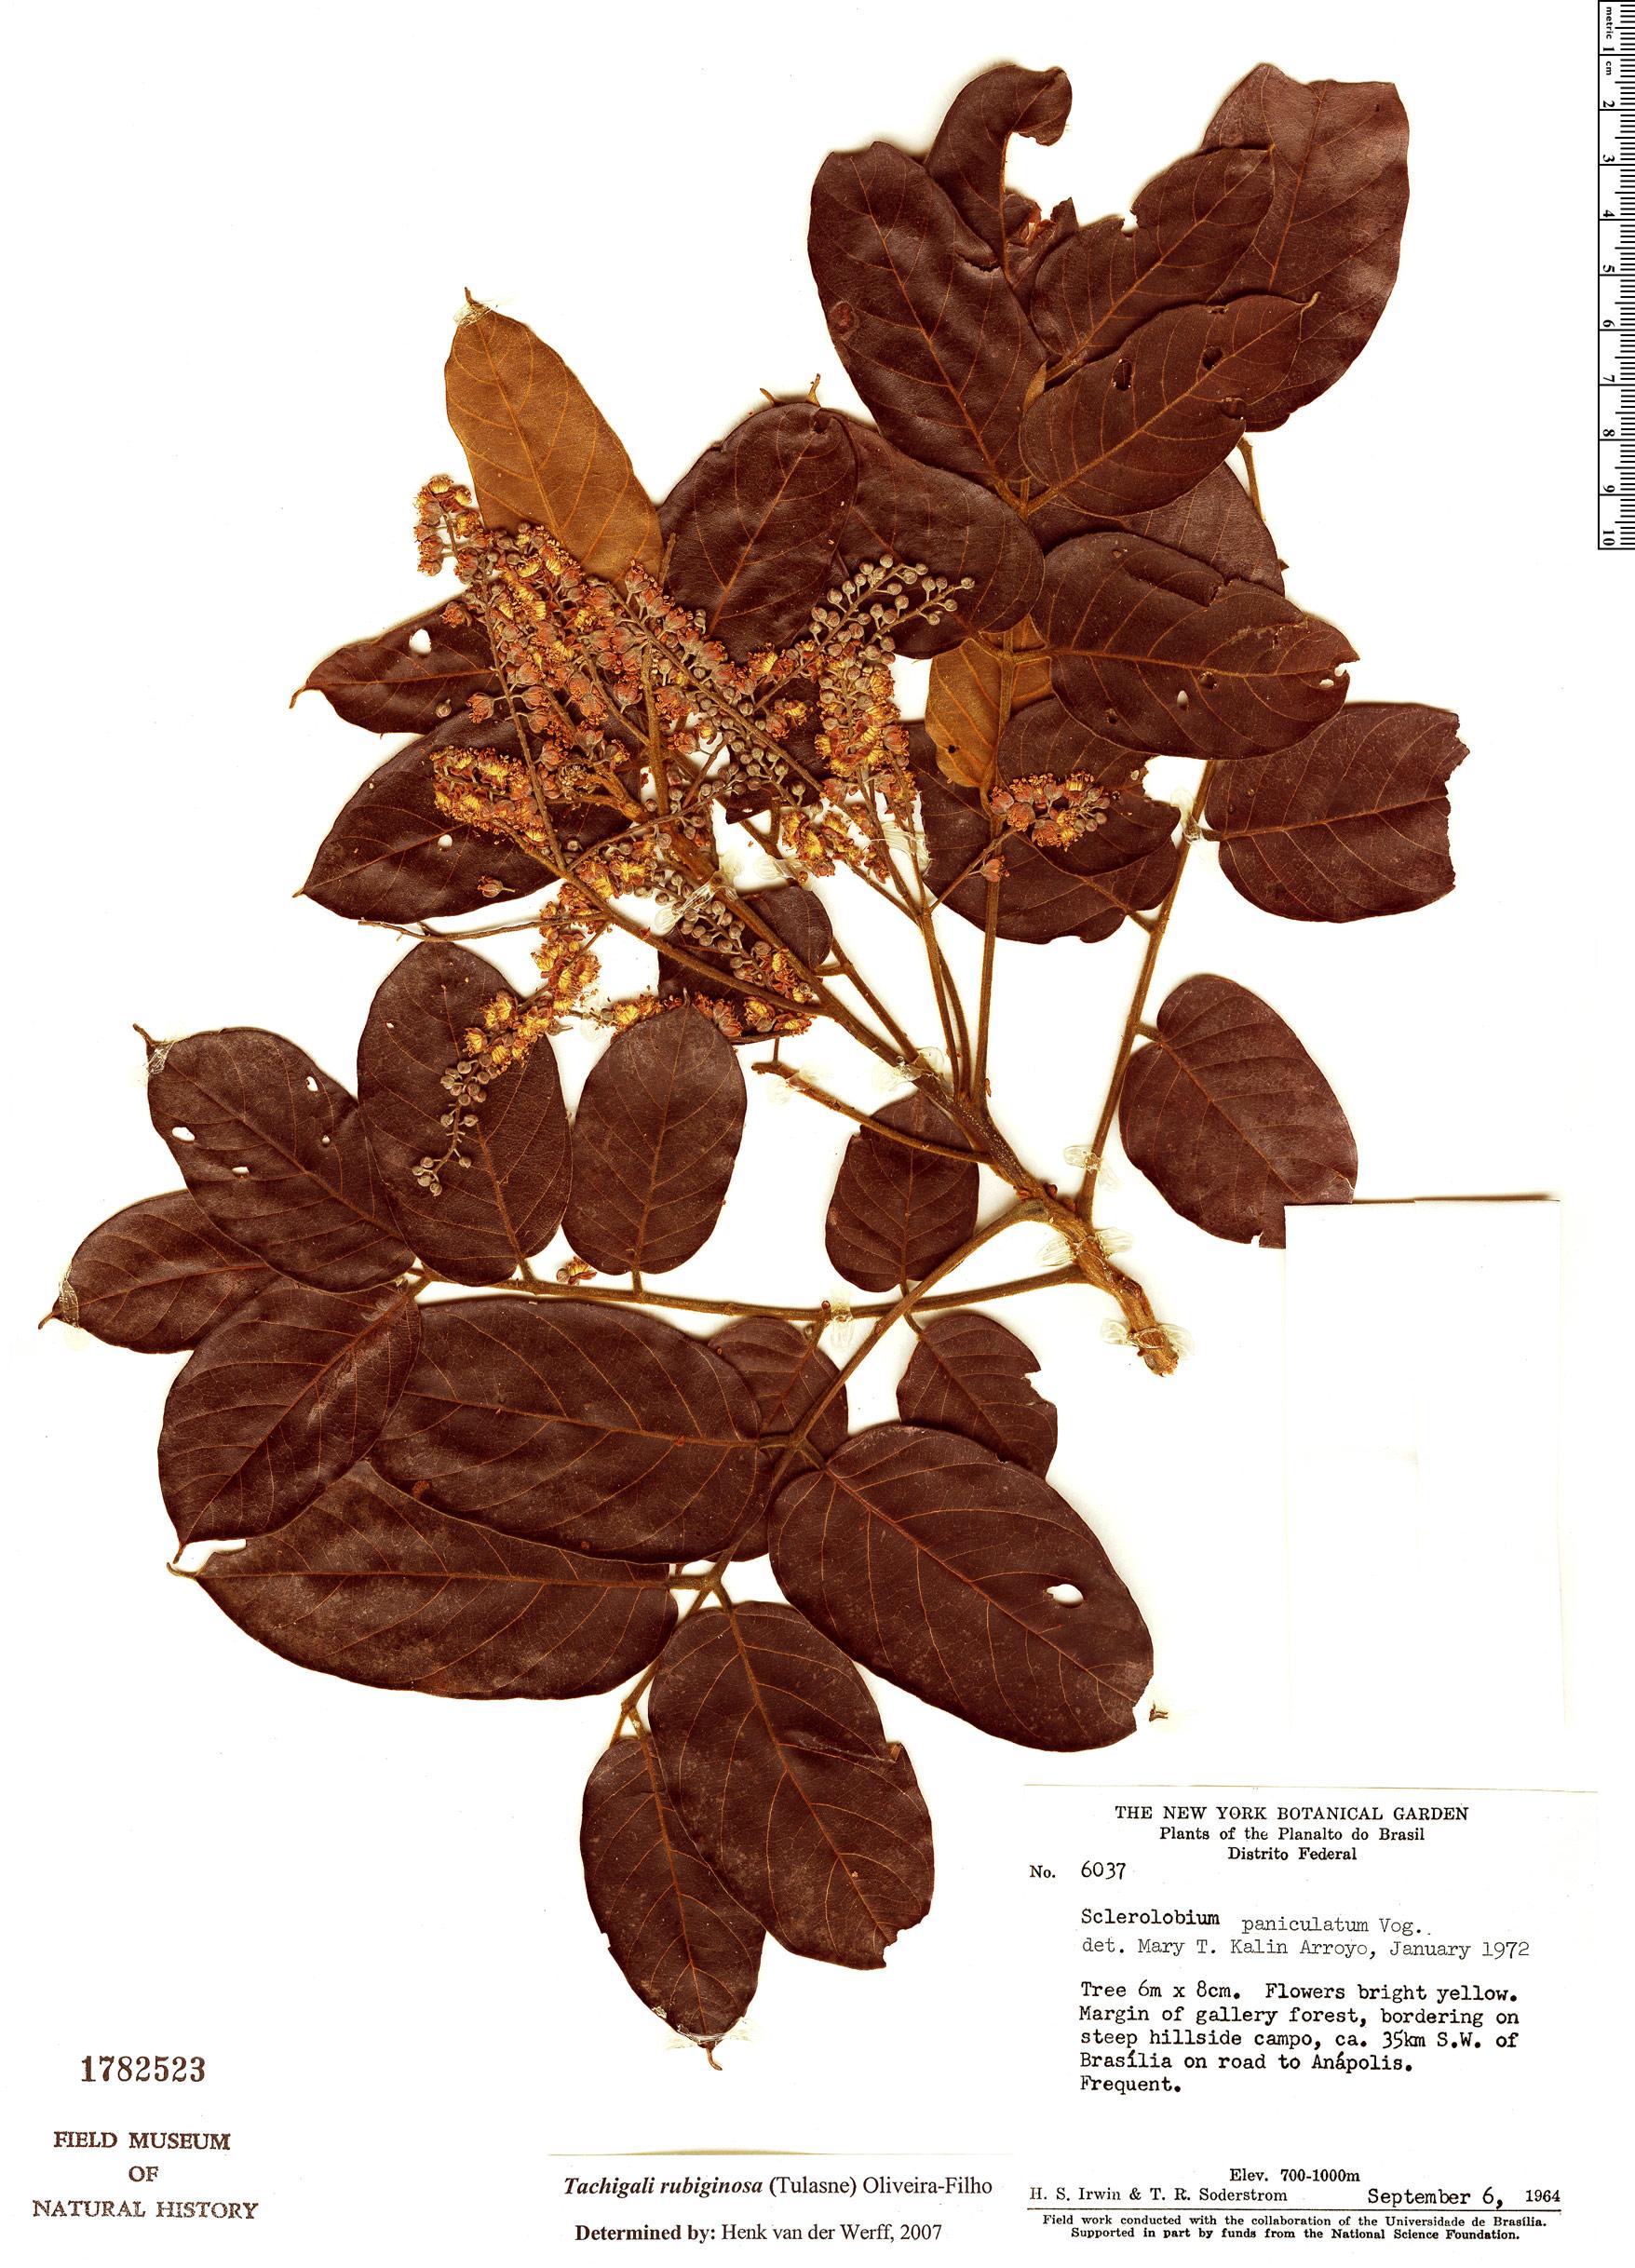 Specimen: Tachigali rubiginosa